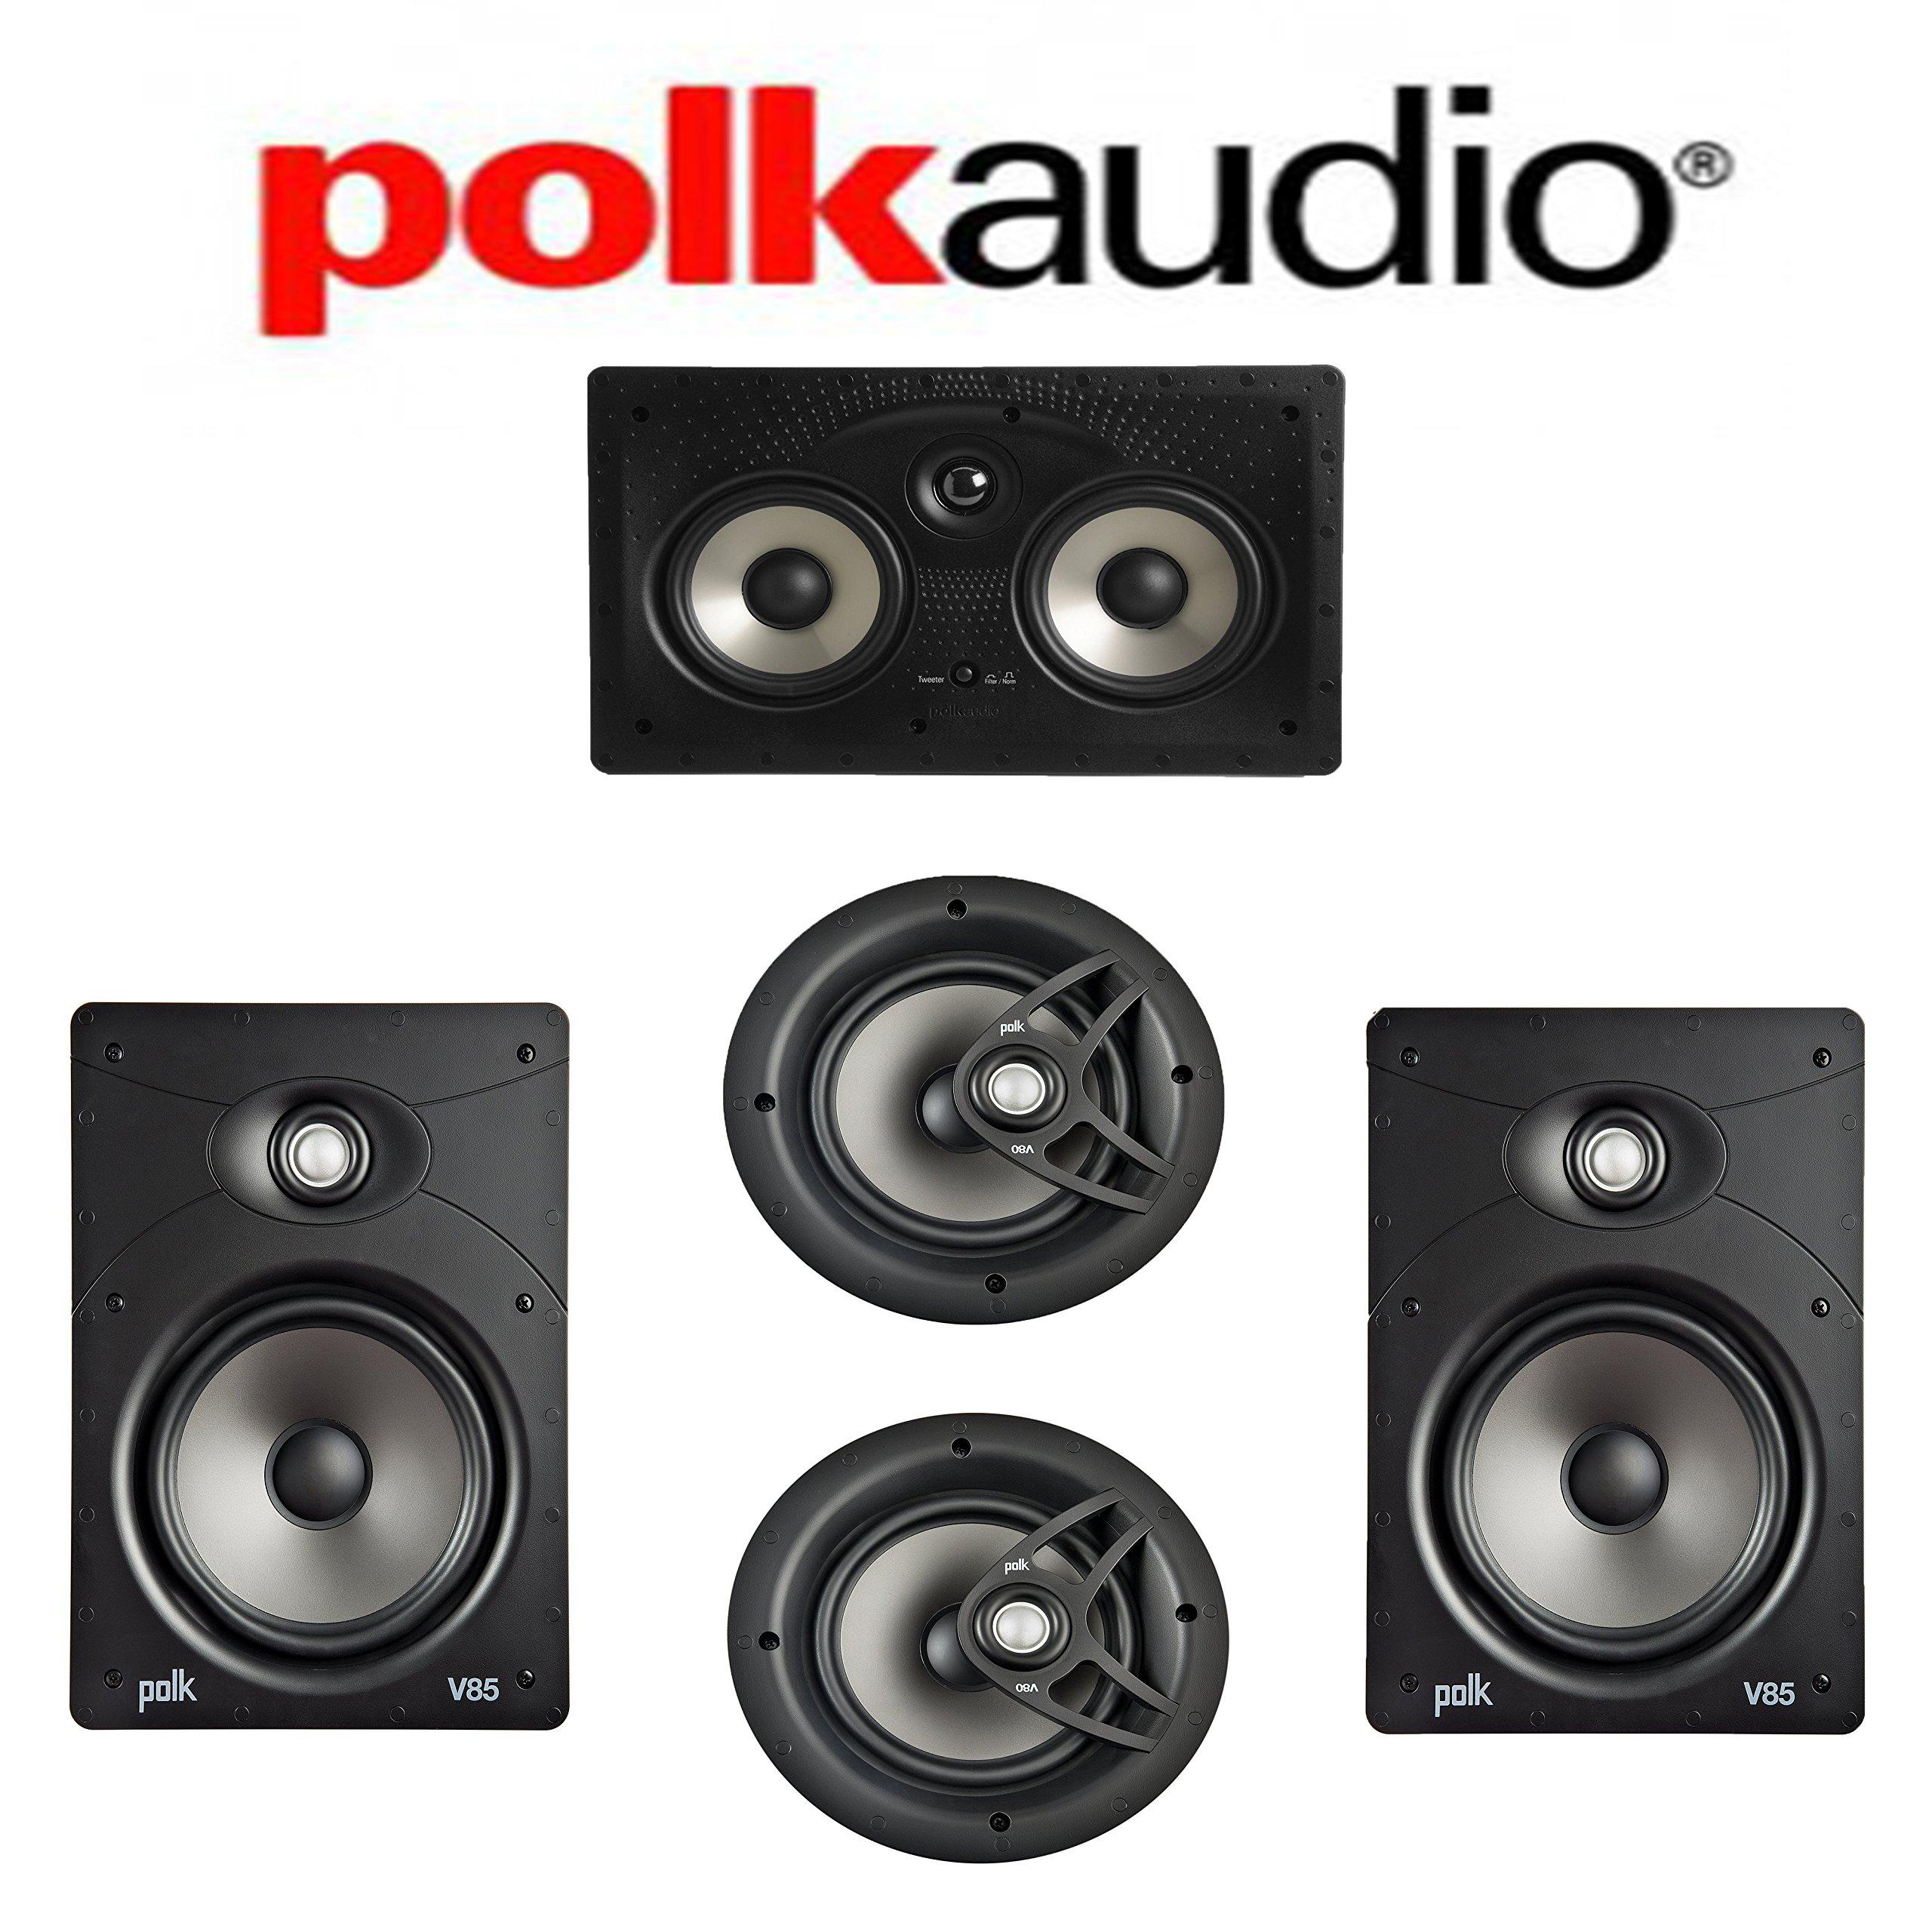 Polk Audio V85 Vanishing Series 5.0 In-Wall / In-Ceiling Home Theater System (V85 + V80 + 255C-RT) by Polk Audio